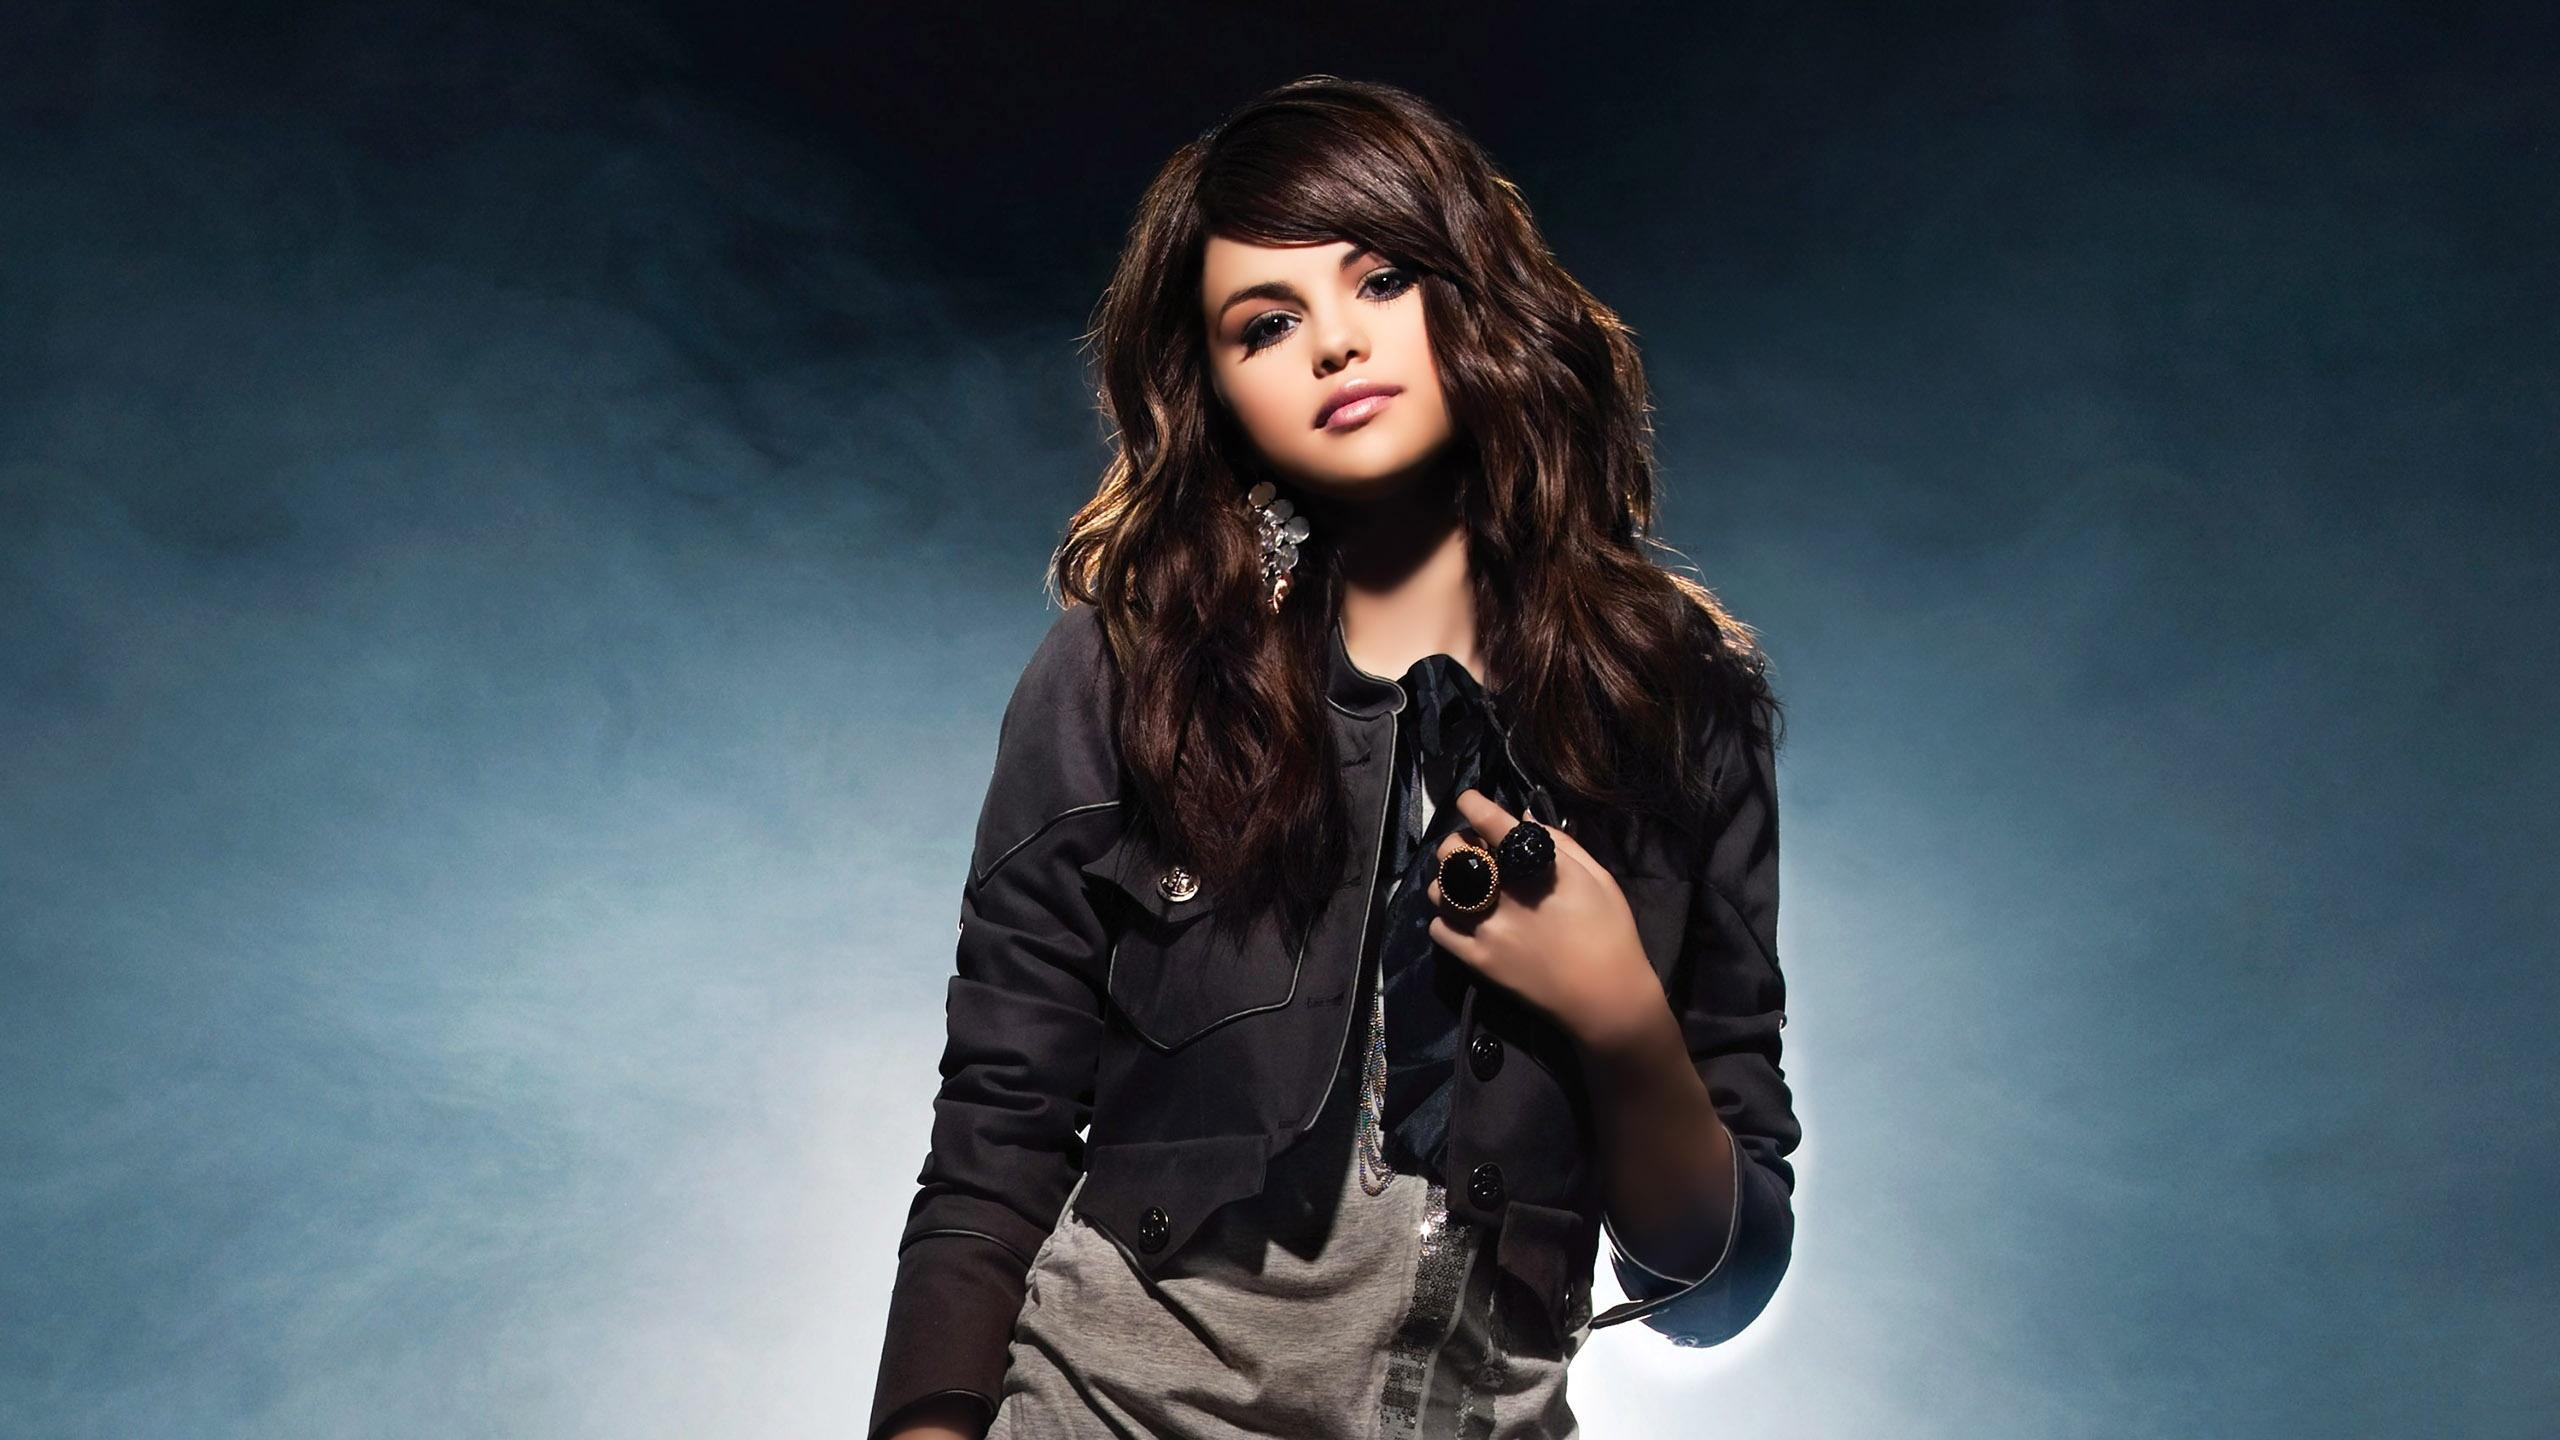 Selena Gomez wallpapers2